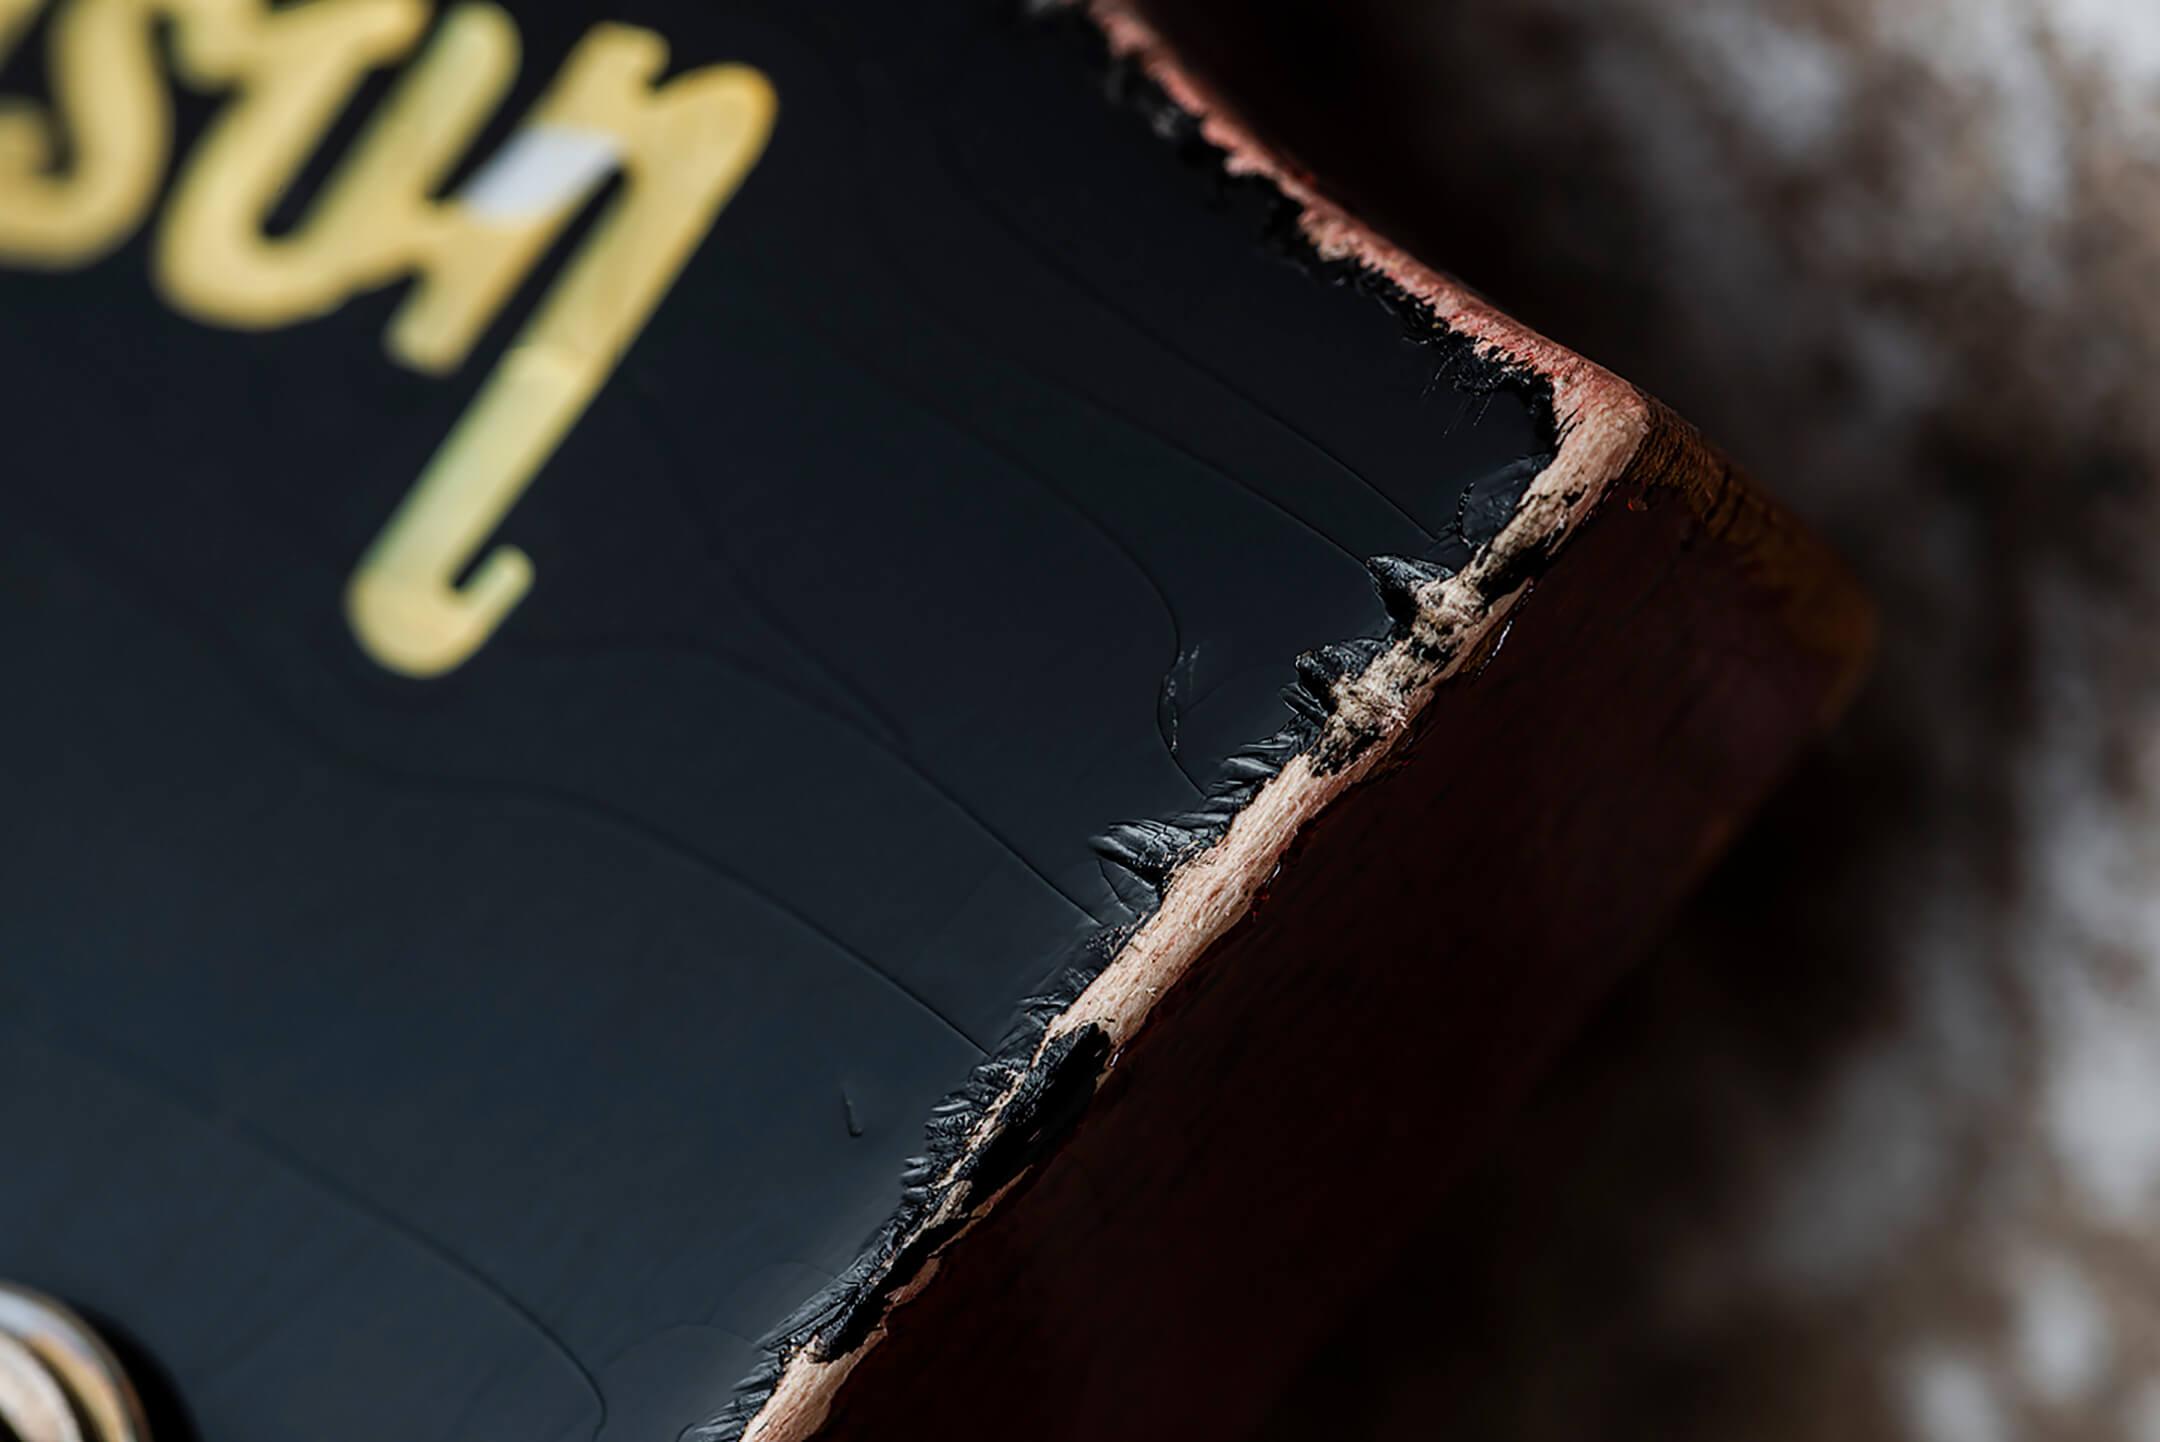 Gibson Murphy Lab Cherry Tea Burst Les Paul Light Aged